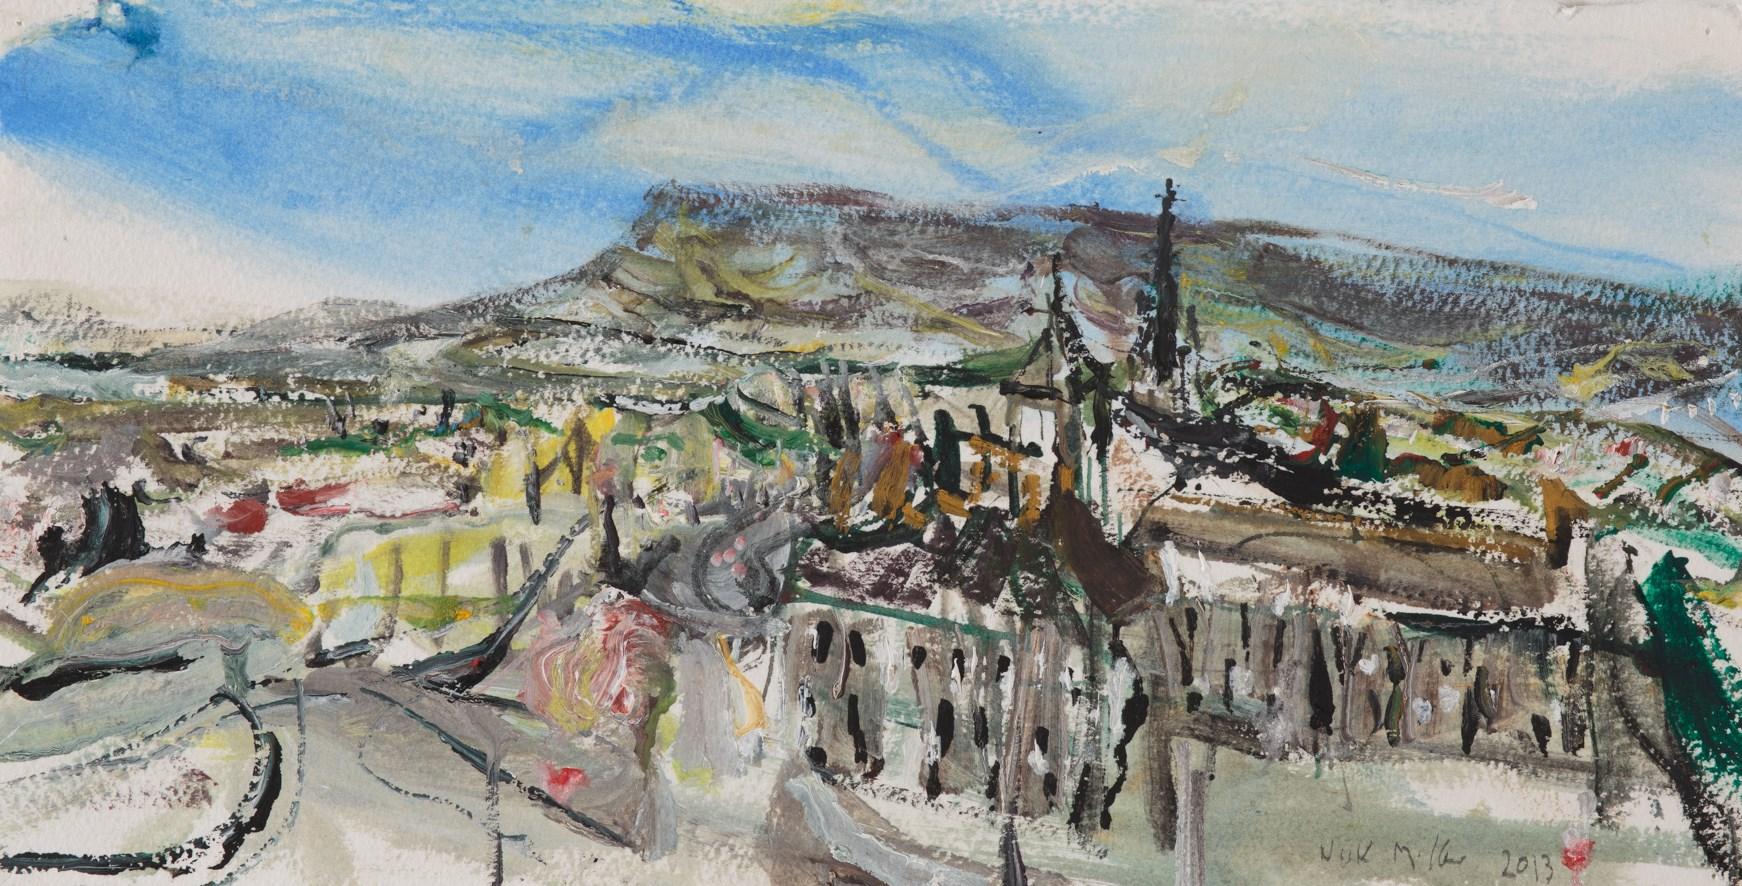 Summerhill 360 study: To Ben Bulben - Nick Miller